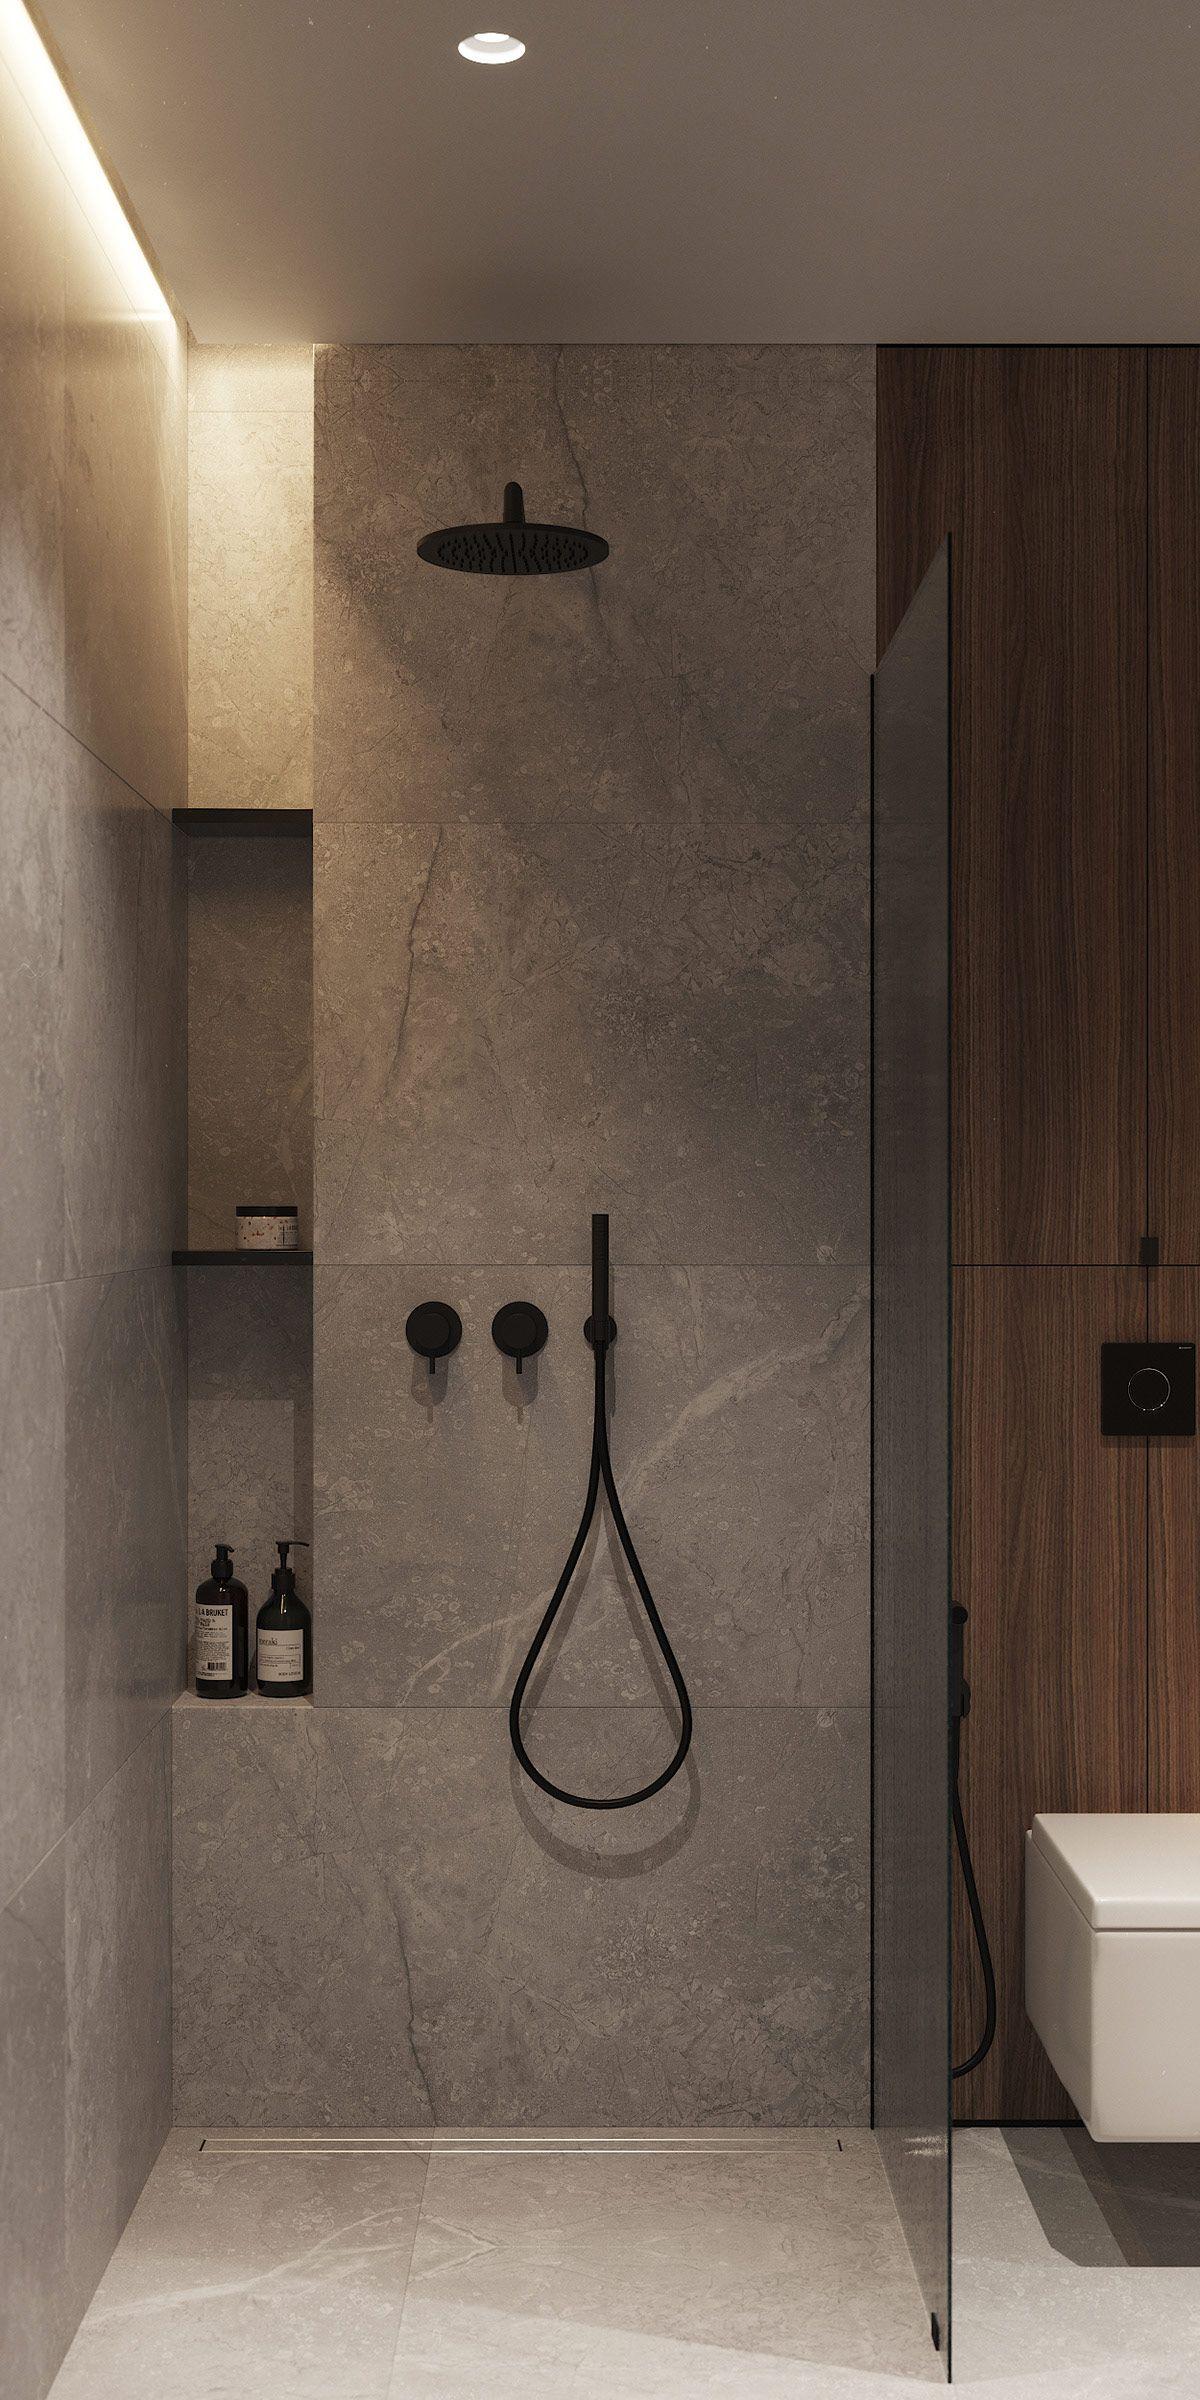 Suave 60 Sqm Home Designs With Black, Grey & Tonal